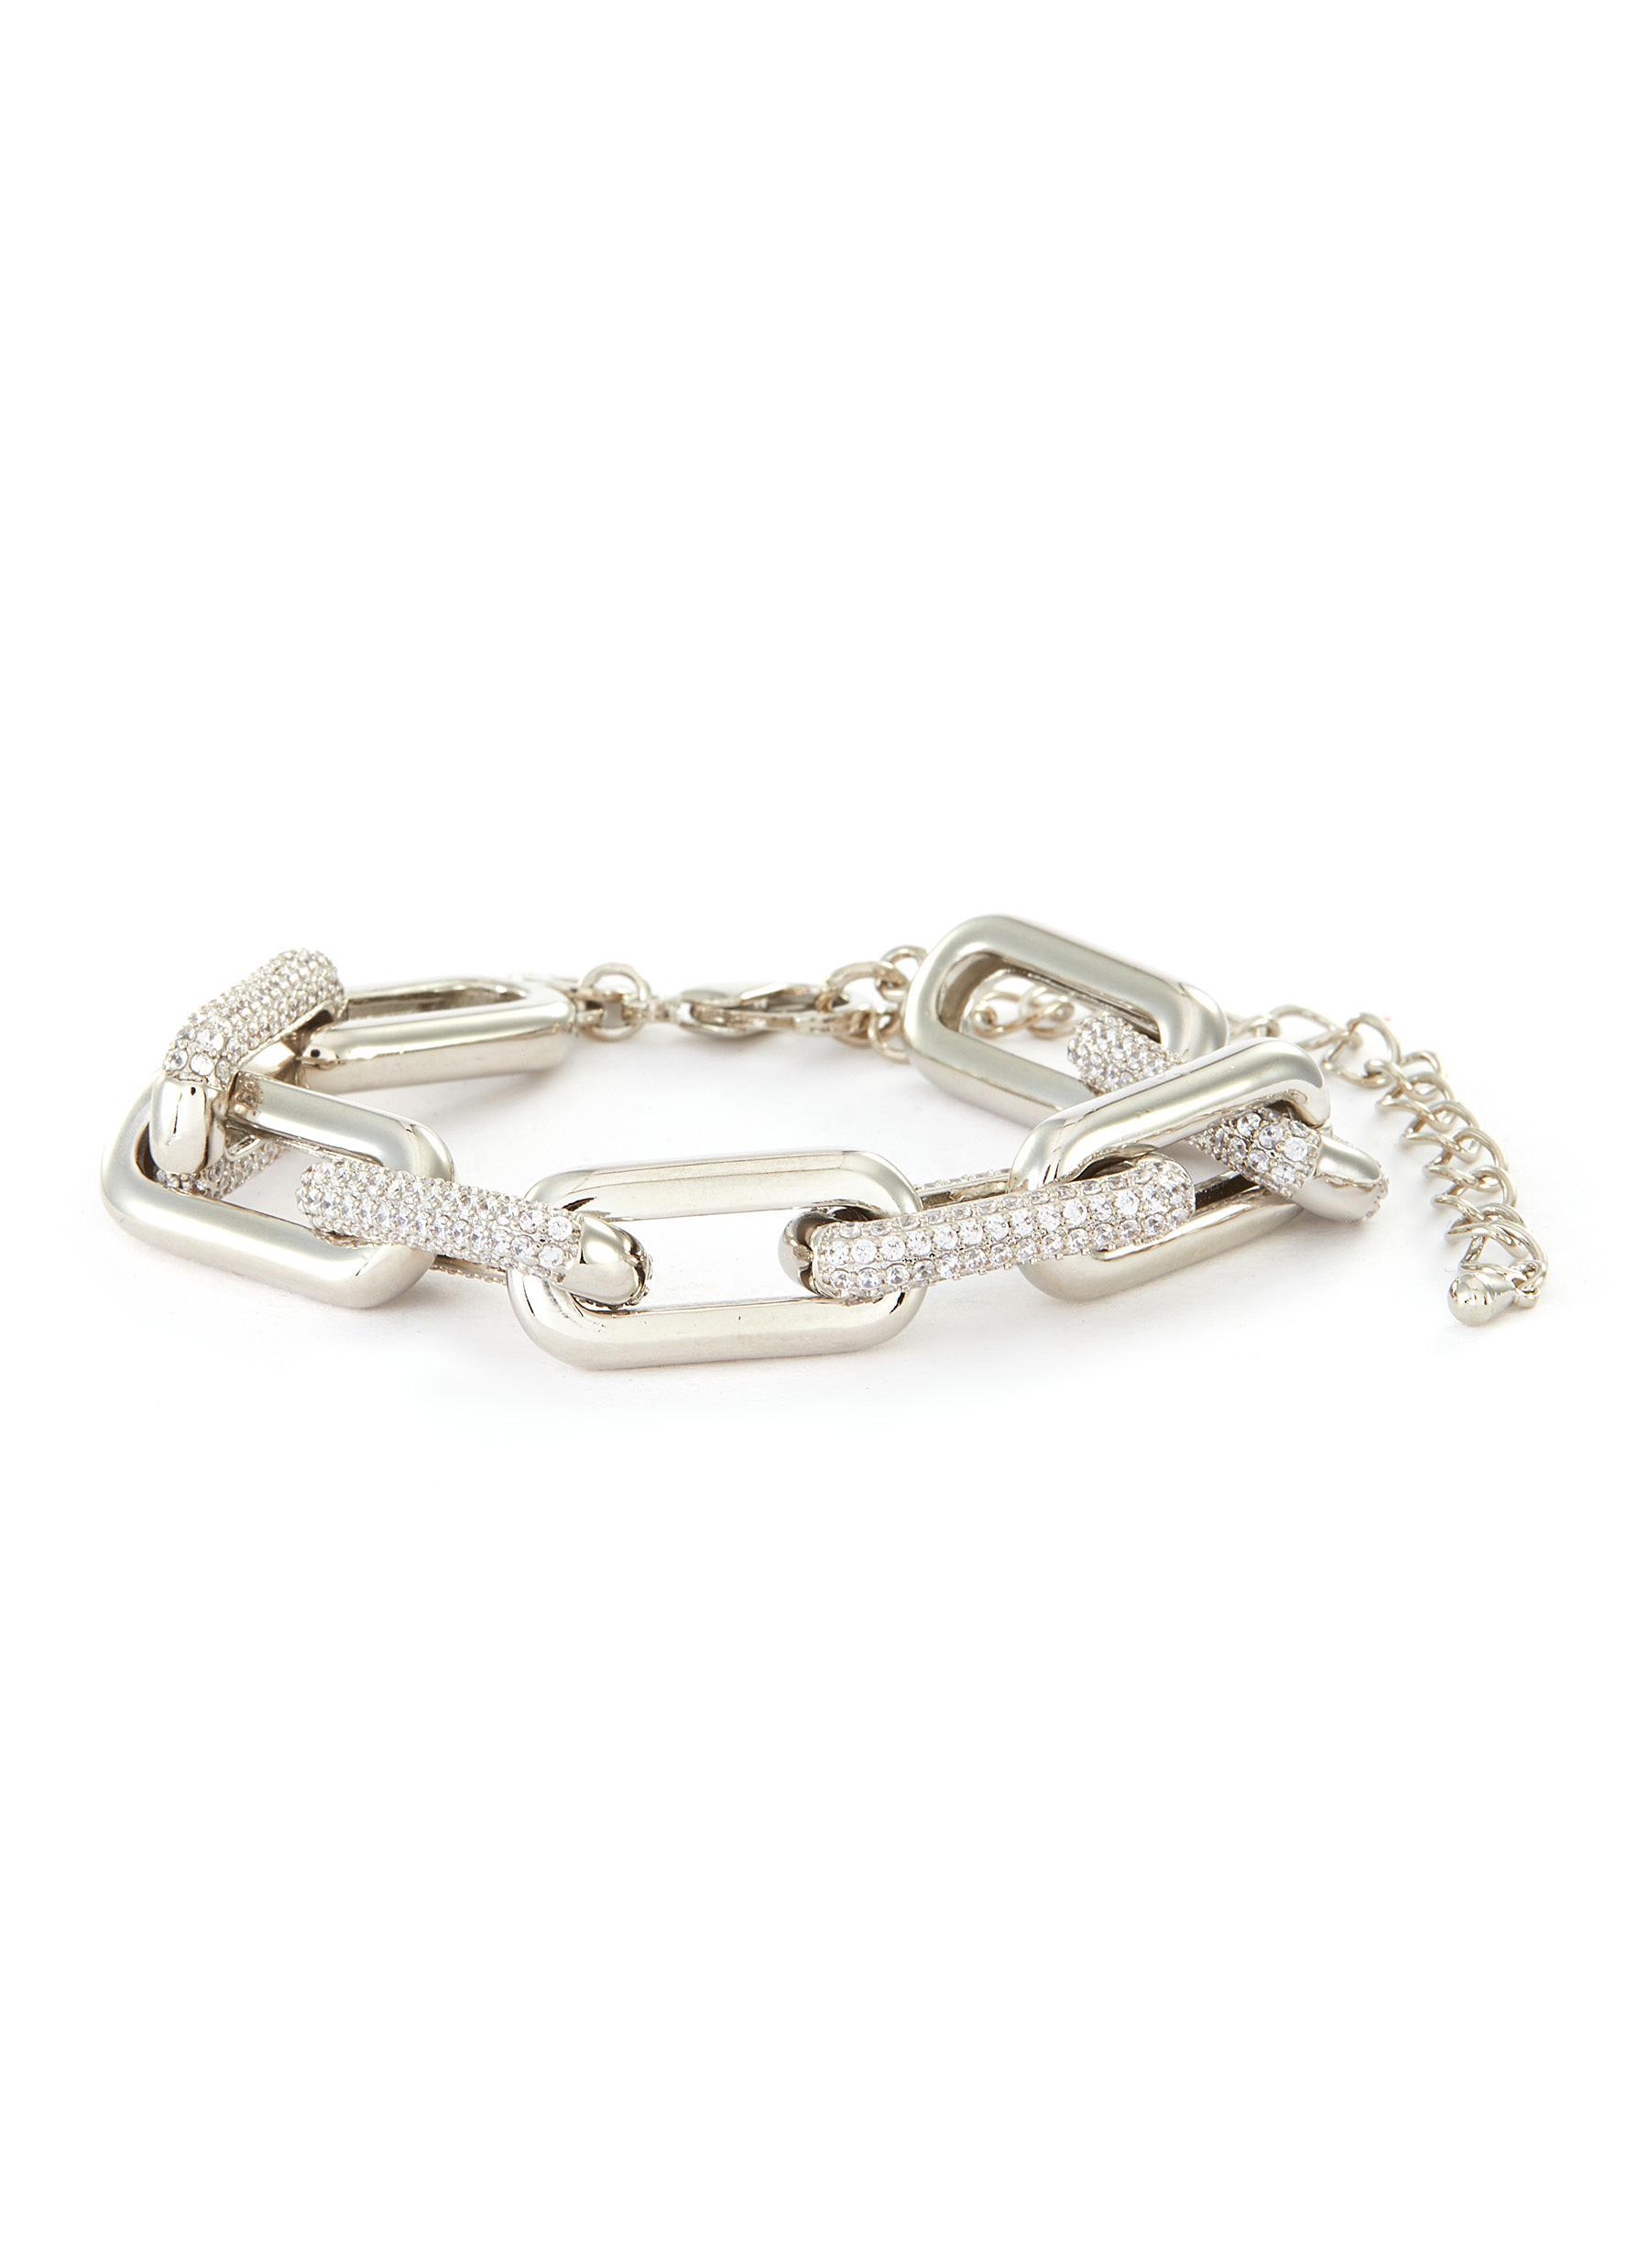 Cubic Zirconia Alternative Link Chain Bracelet